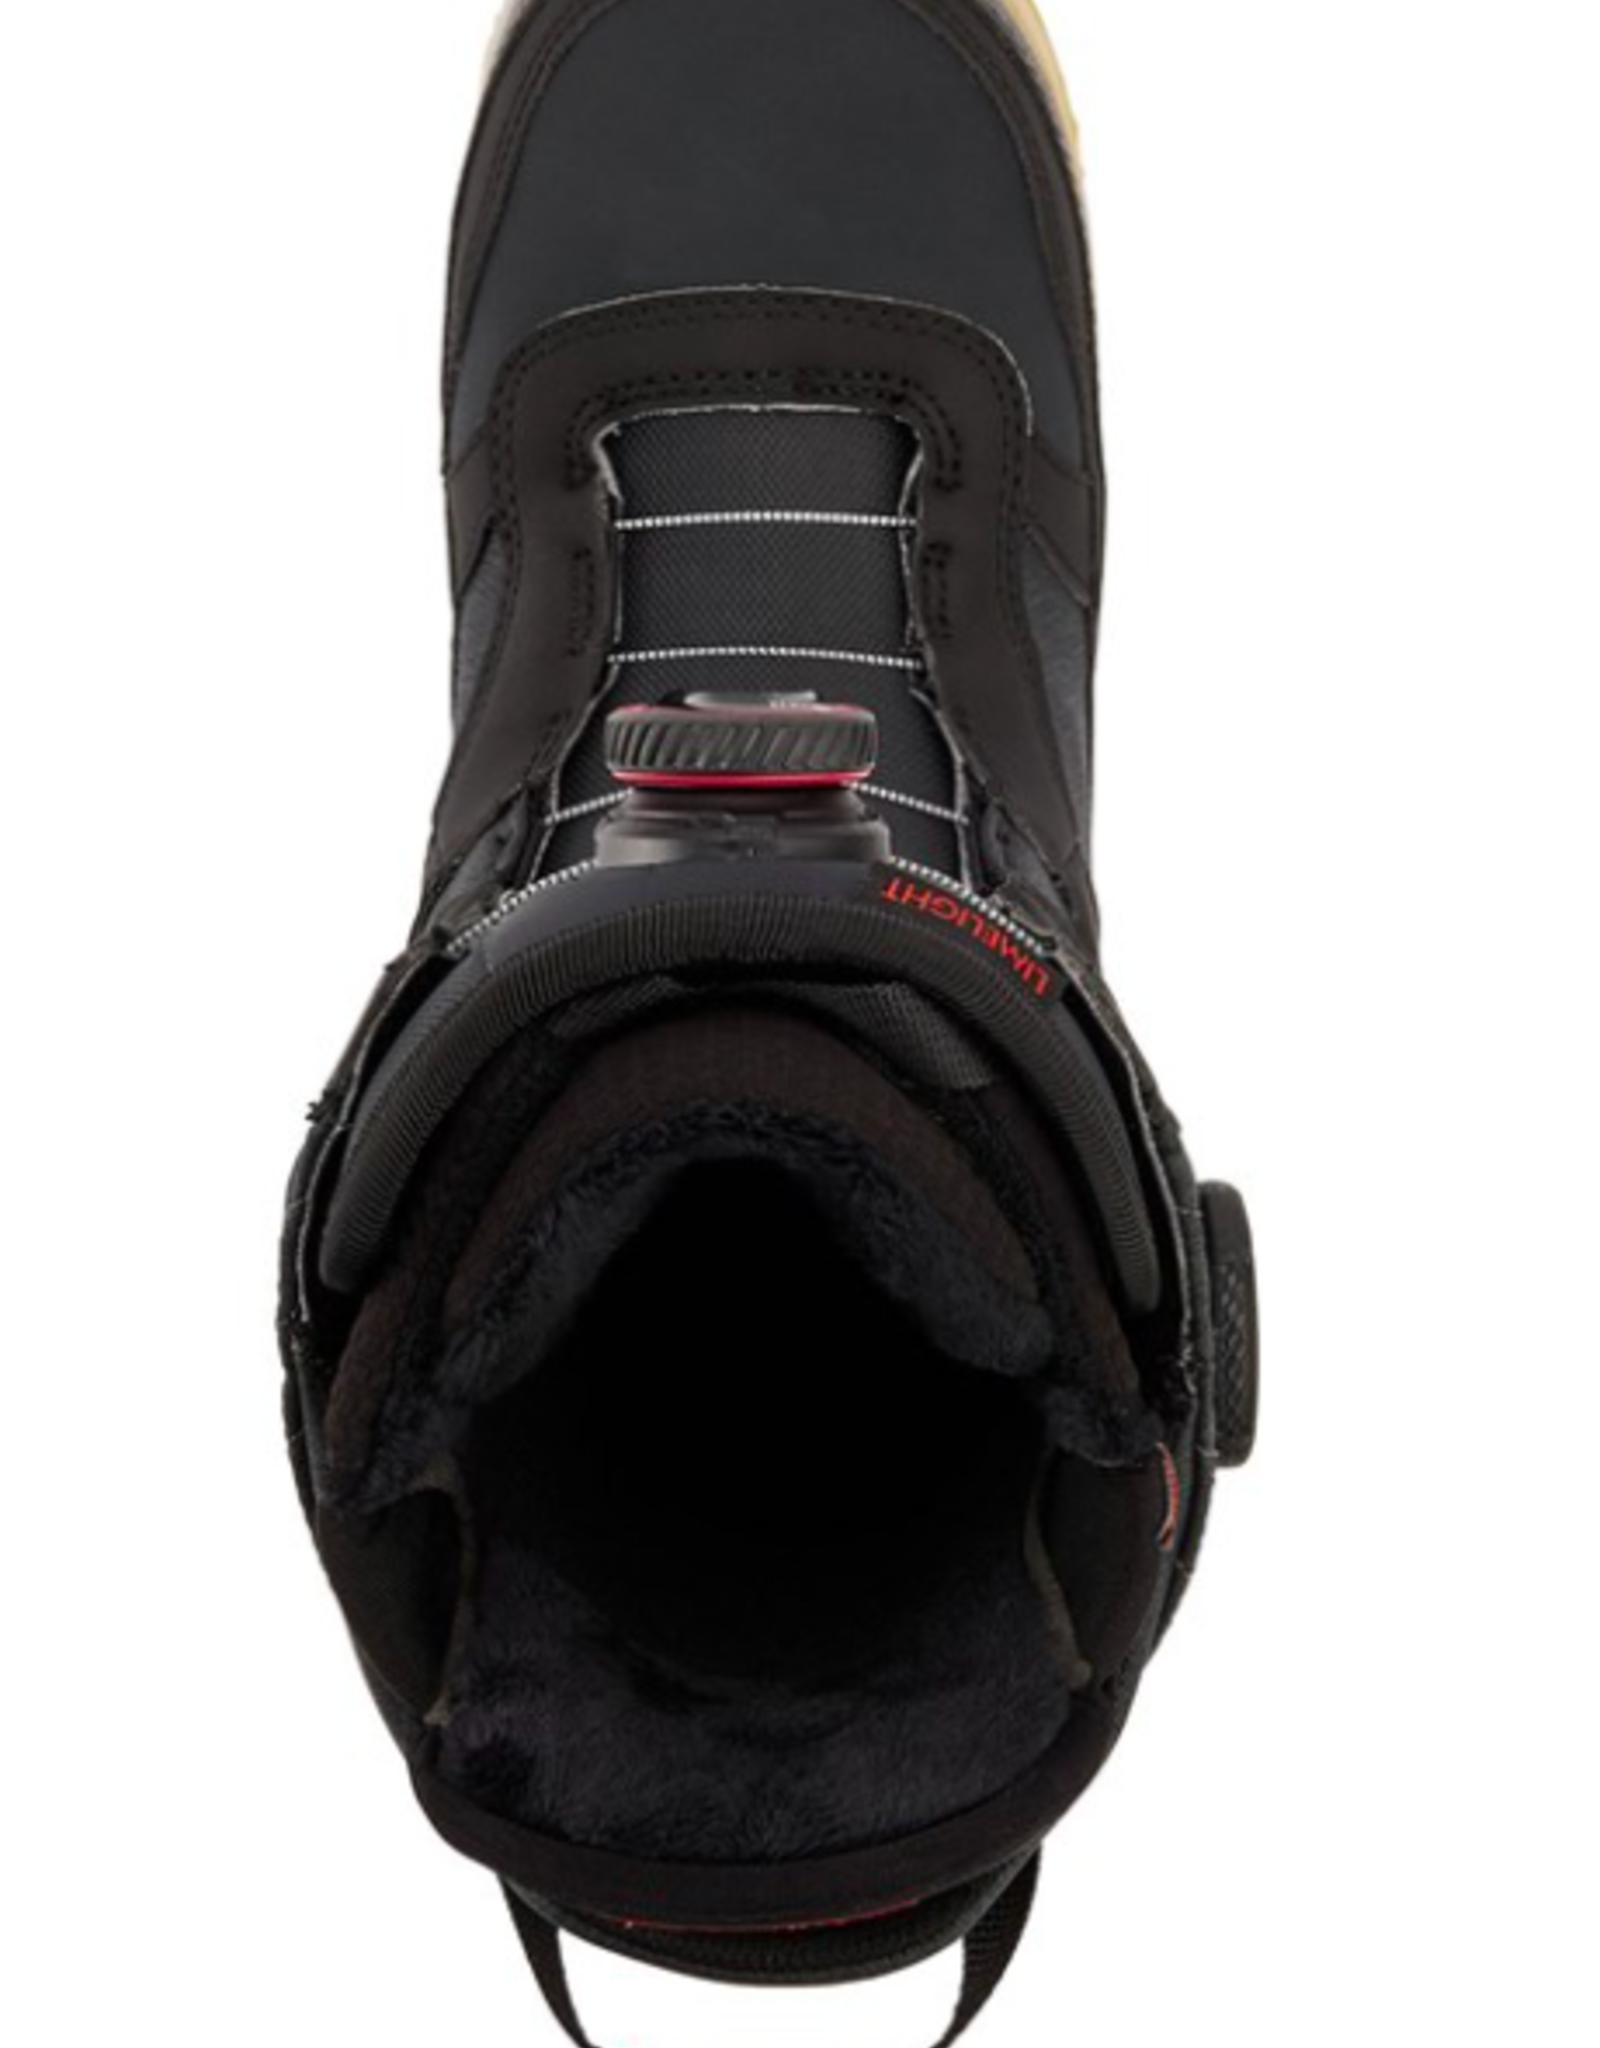 BURTON Burton Women's Limelight Boa Snowboard Boots Black 2022